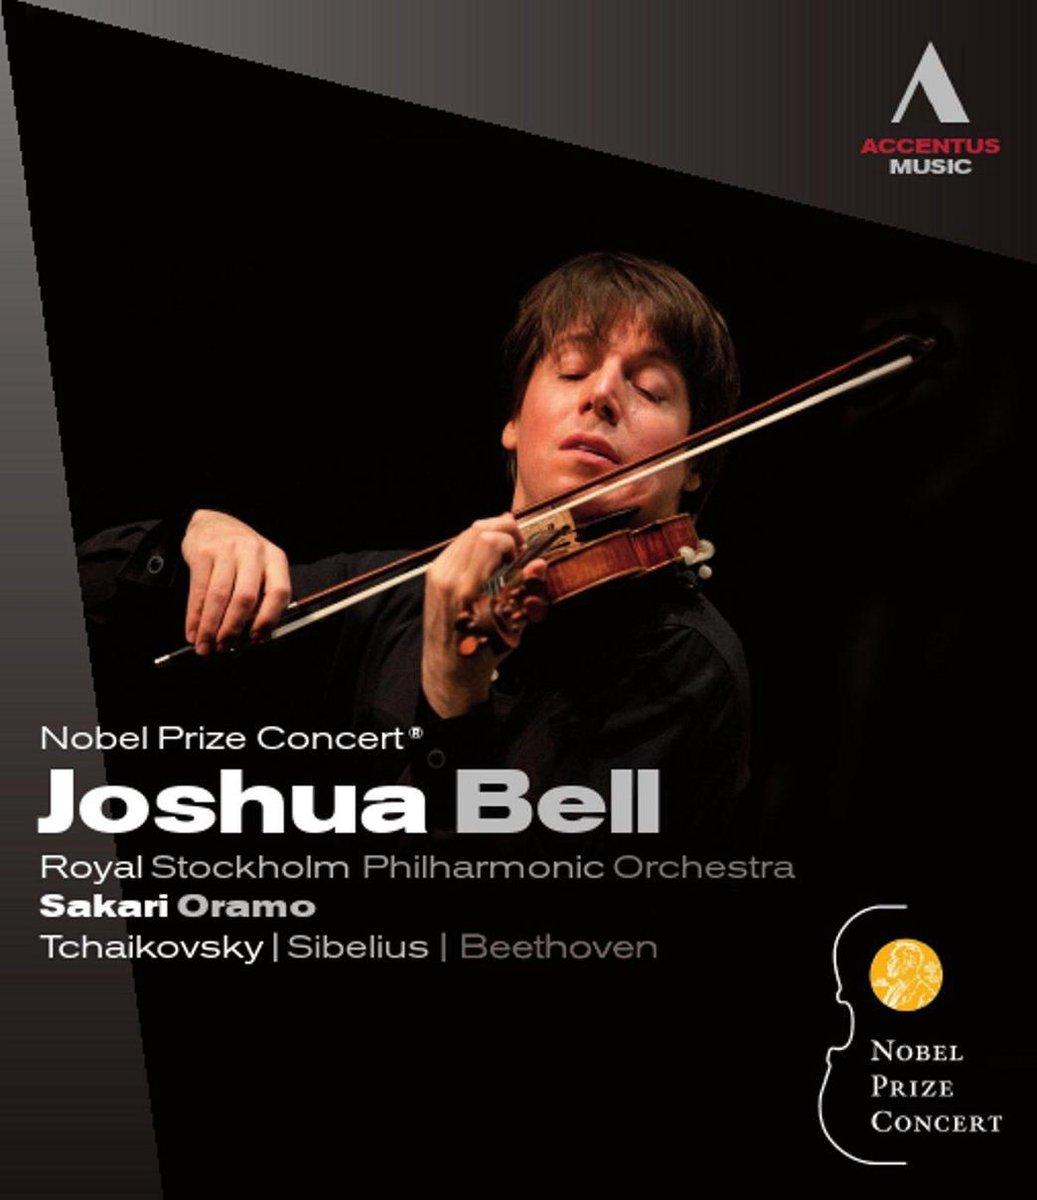 Joshua Bell - Nobel Prize Concert - Joshua Bell